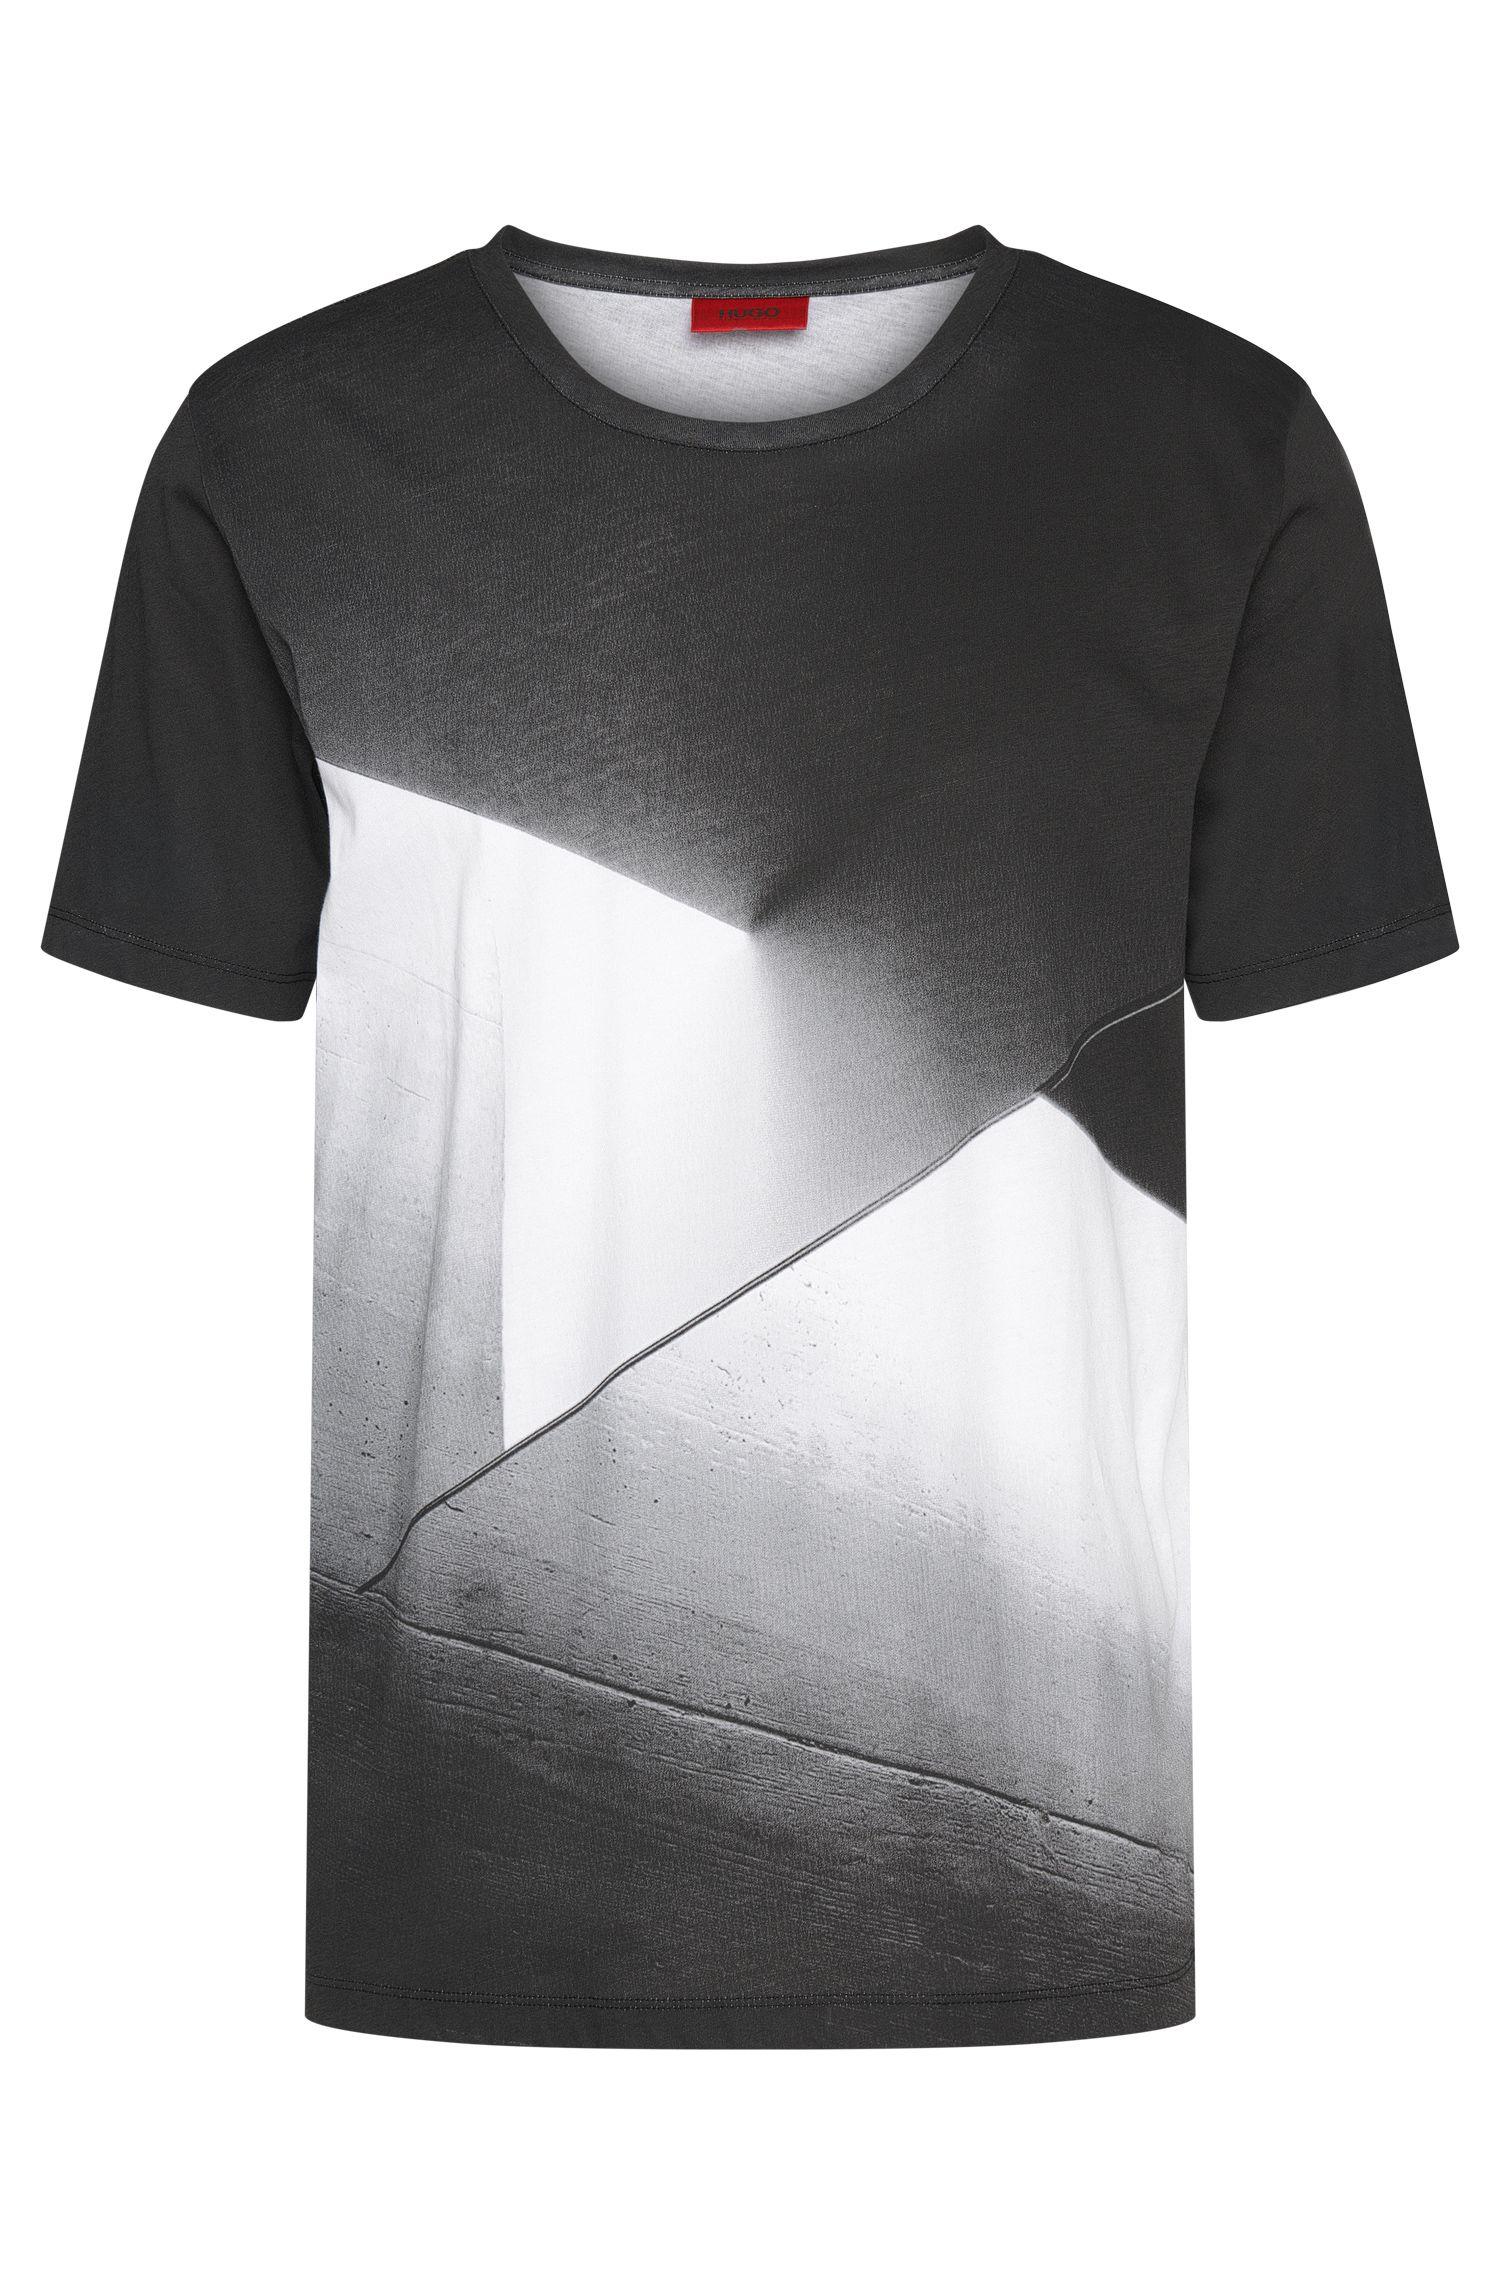 'Dicino' | Cotton Printed T-Shirt